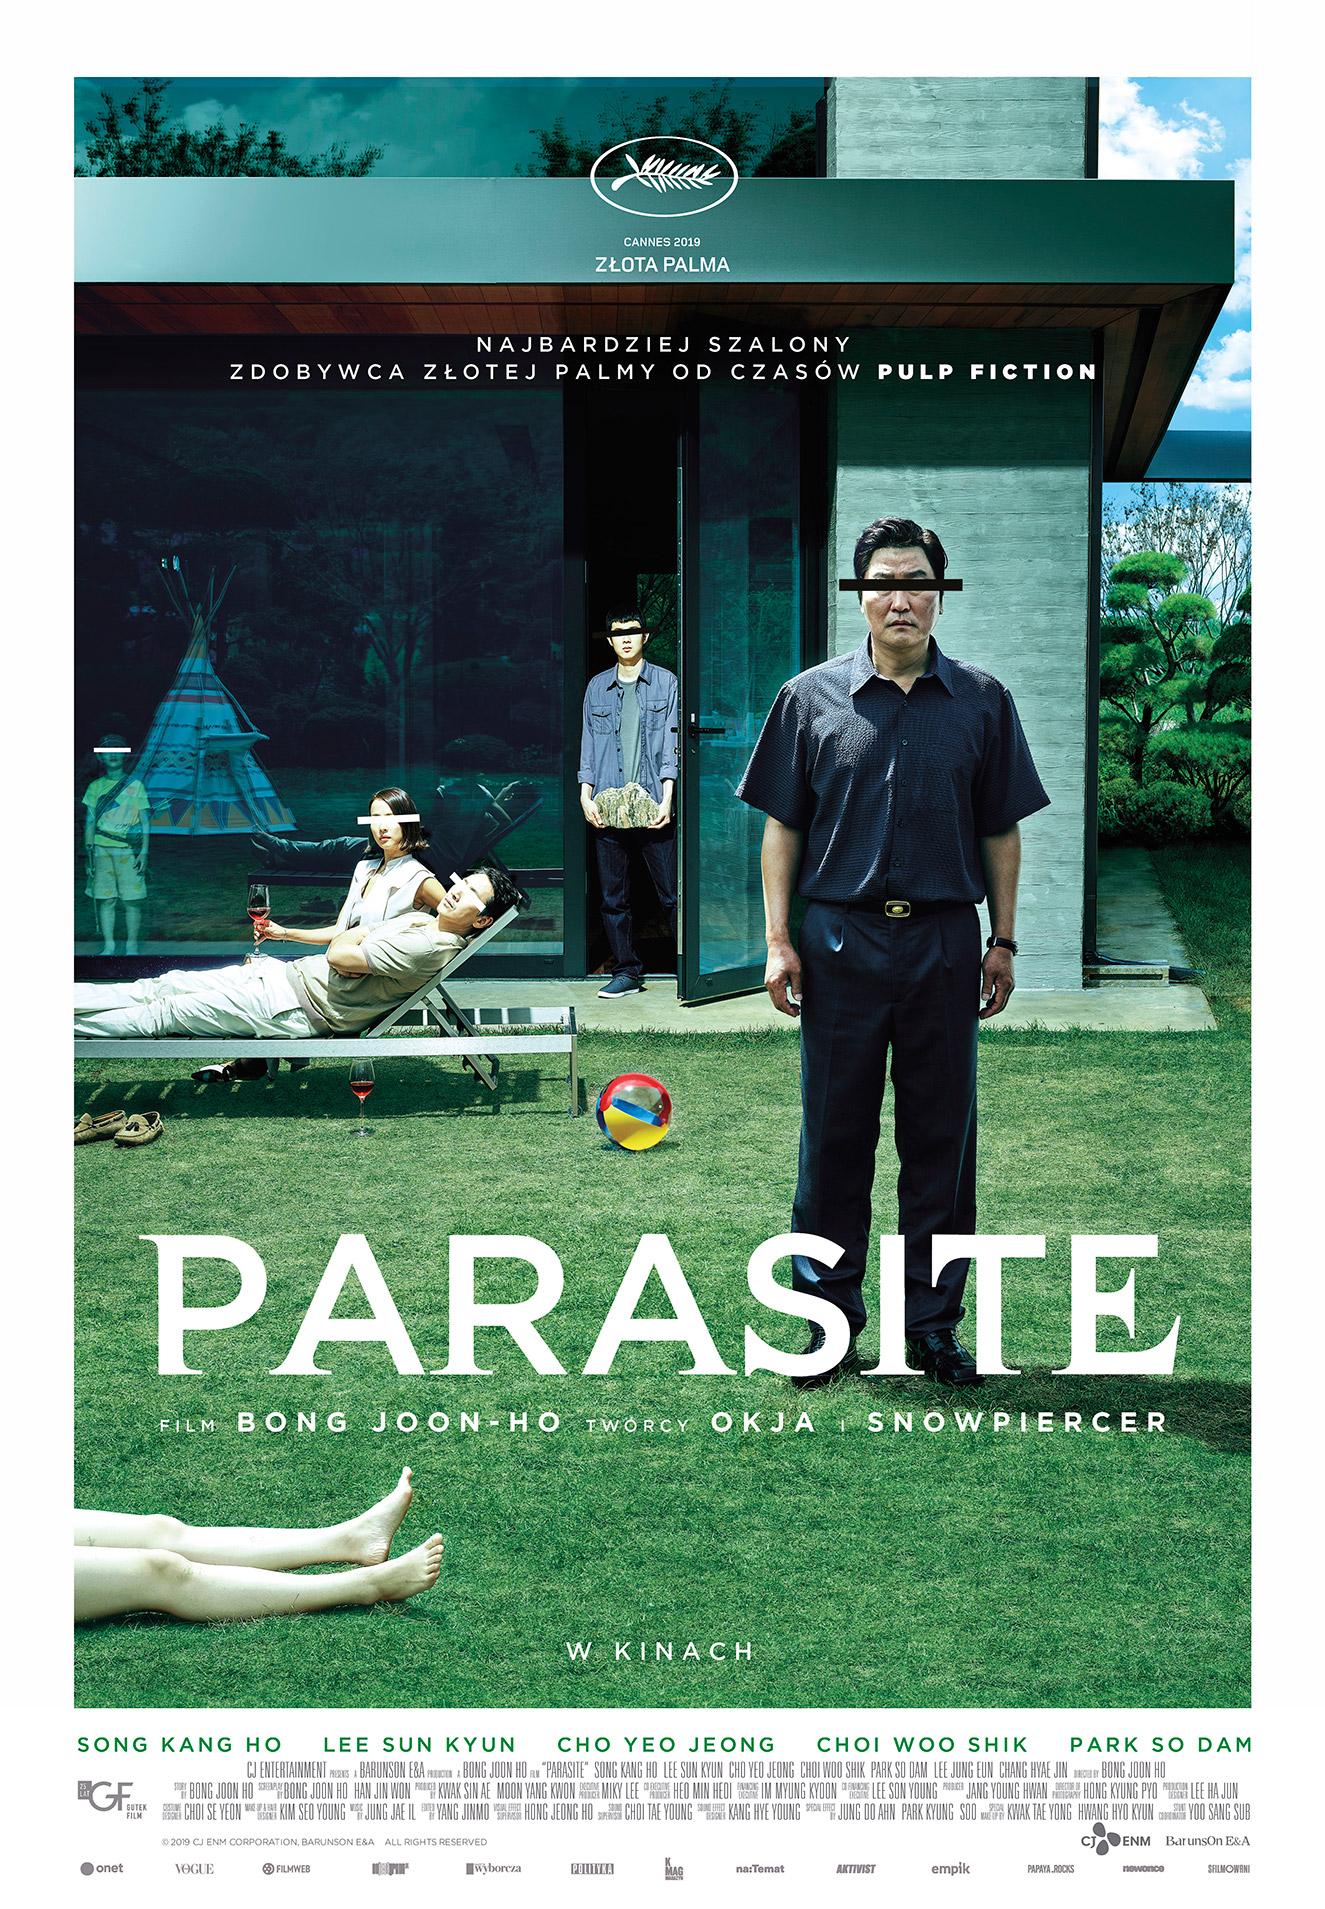 plakat promujący film Parasite